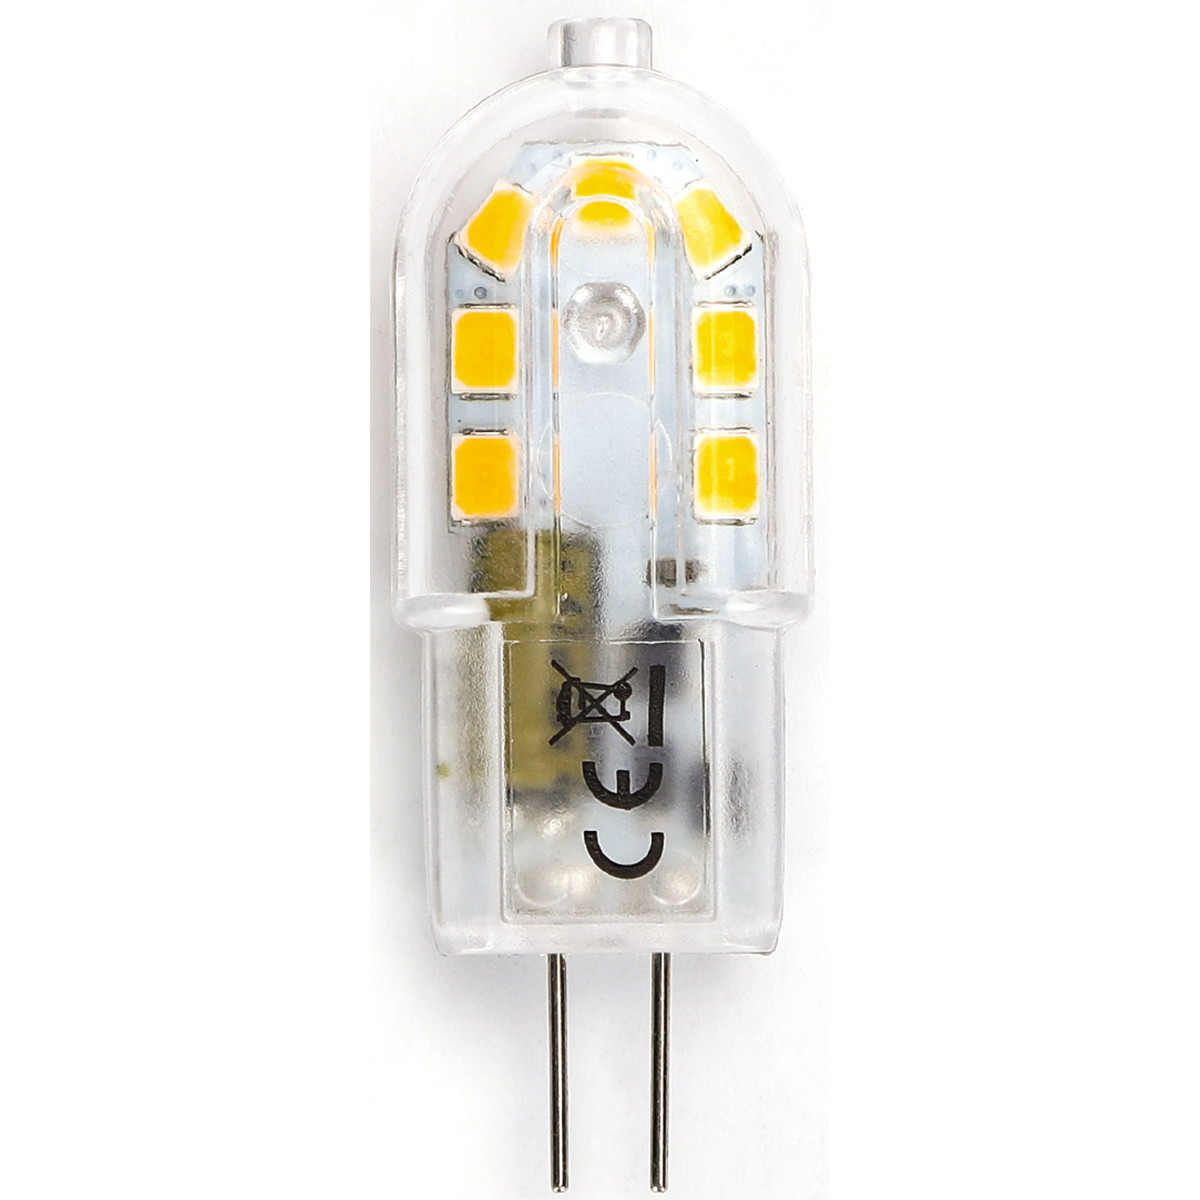 LED Lamp - Aigi - G4 Fitting - 2W - Warm Wit 3000K | Vervangt 20W